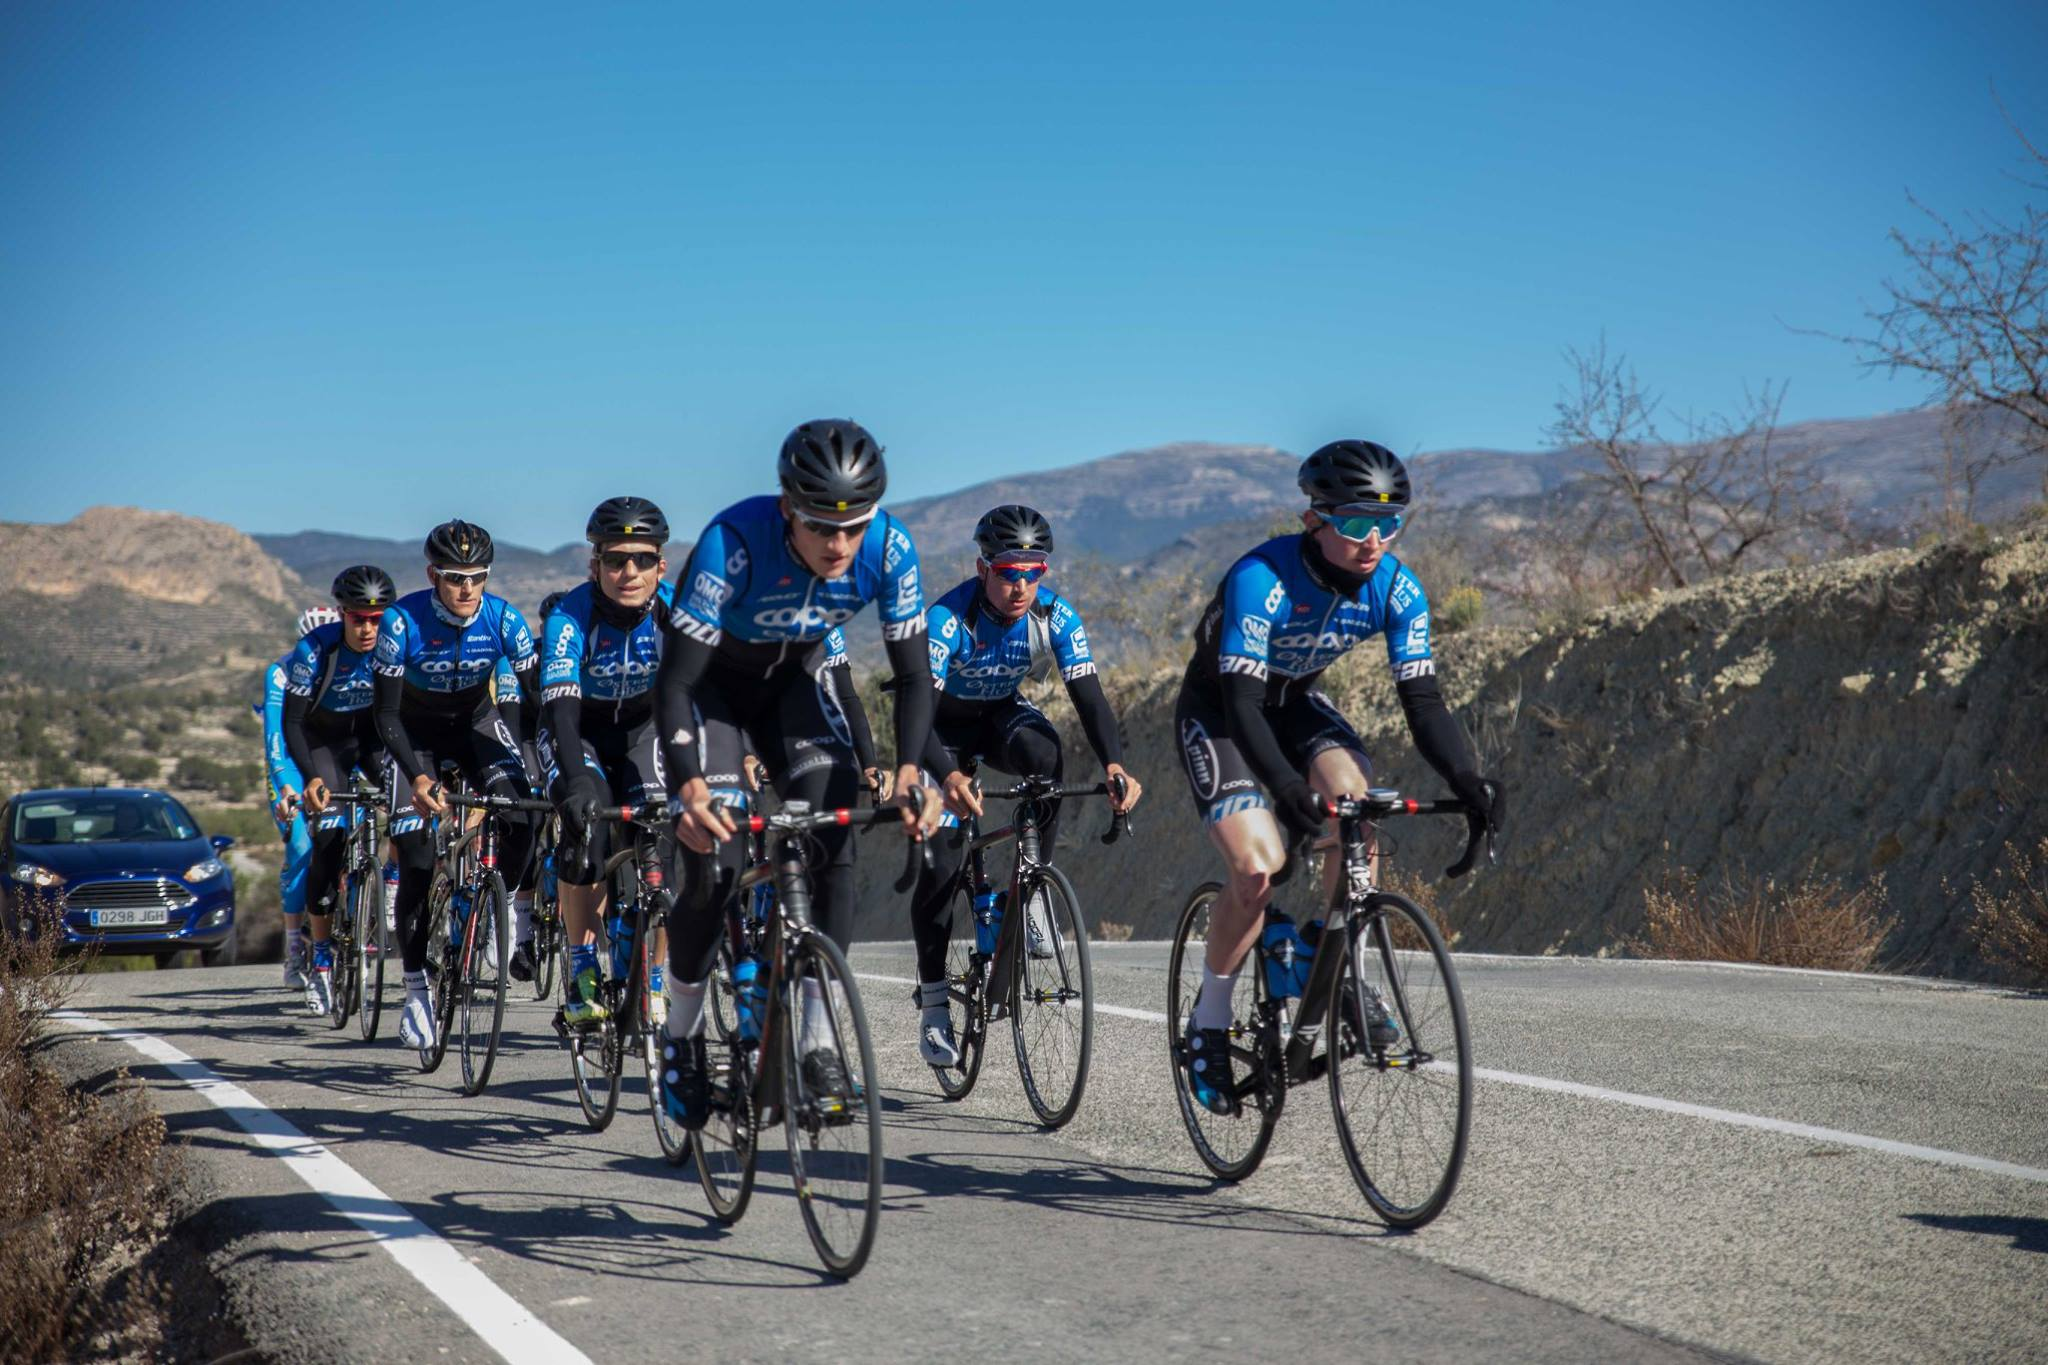 Langt: Som heltidssyklist må man ut på trening uansett vær. Foto: Team Coop - Øster Hus / Erik Flæsen Dalen